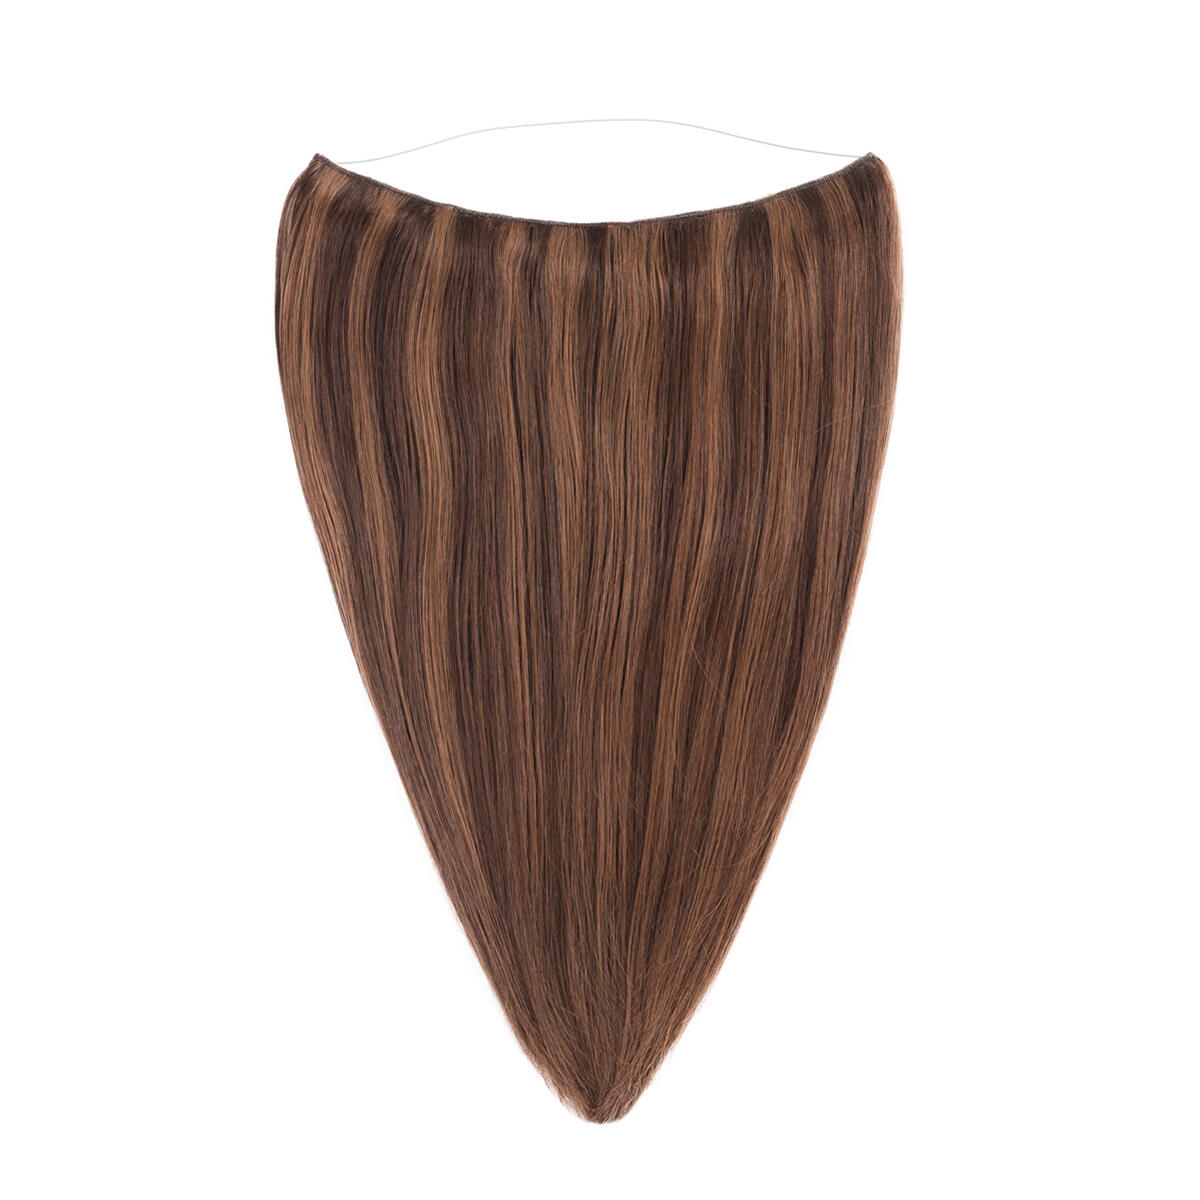 Hairband Original M2.3/5.0 Chocolate Mix 45 cm